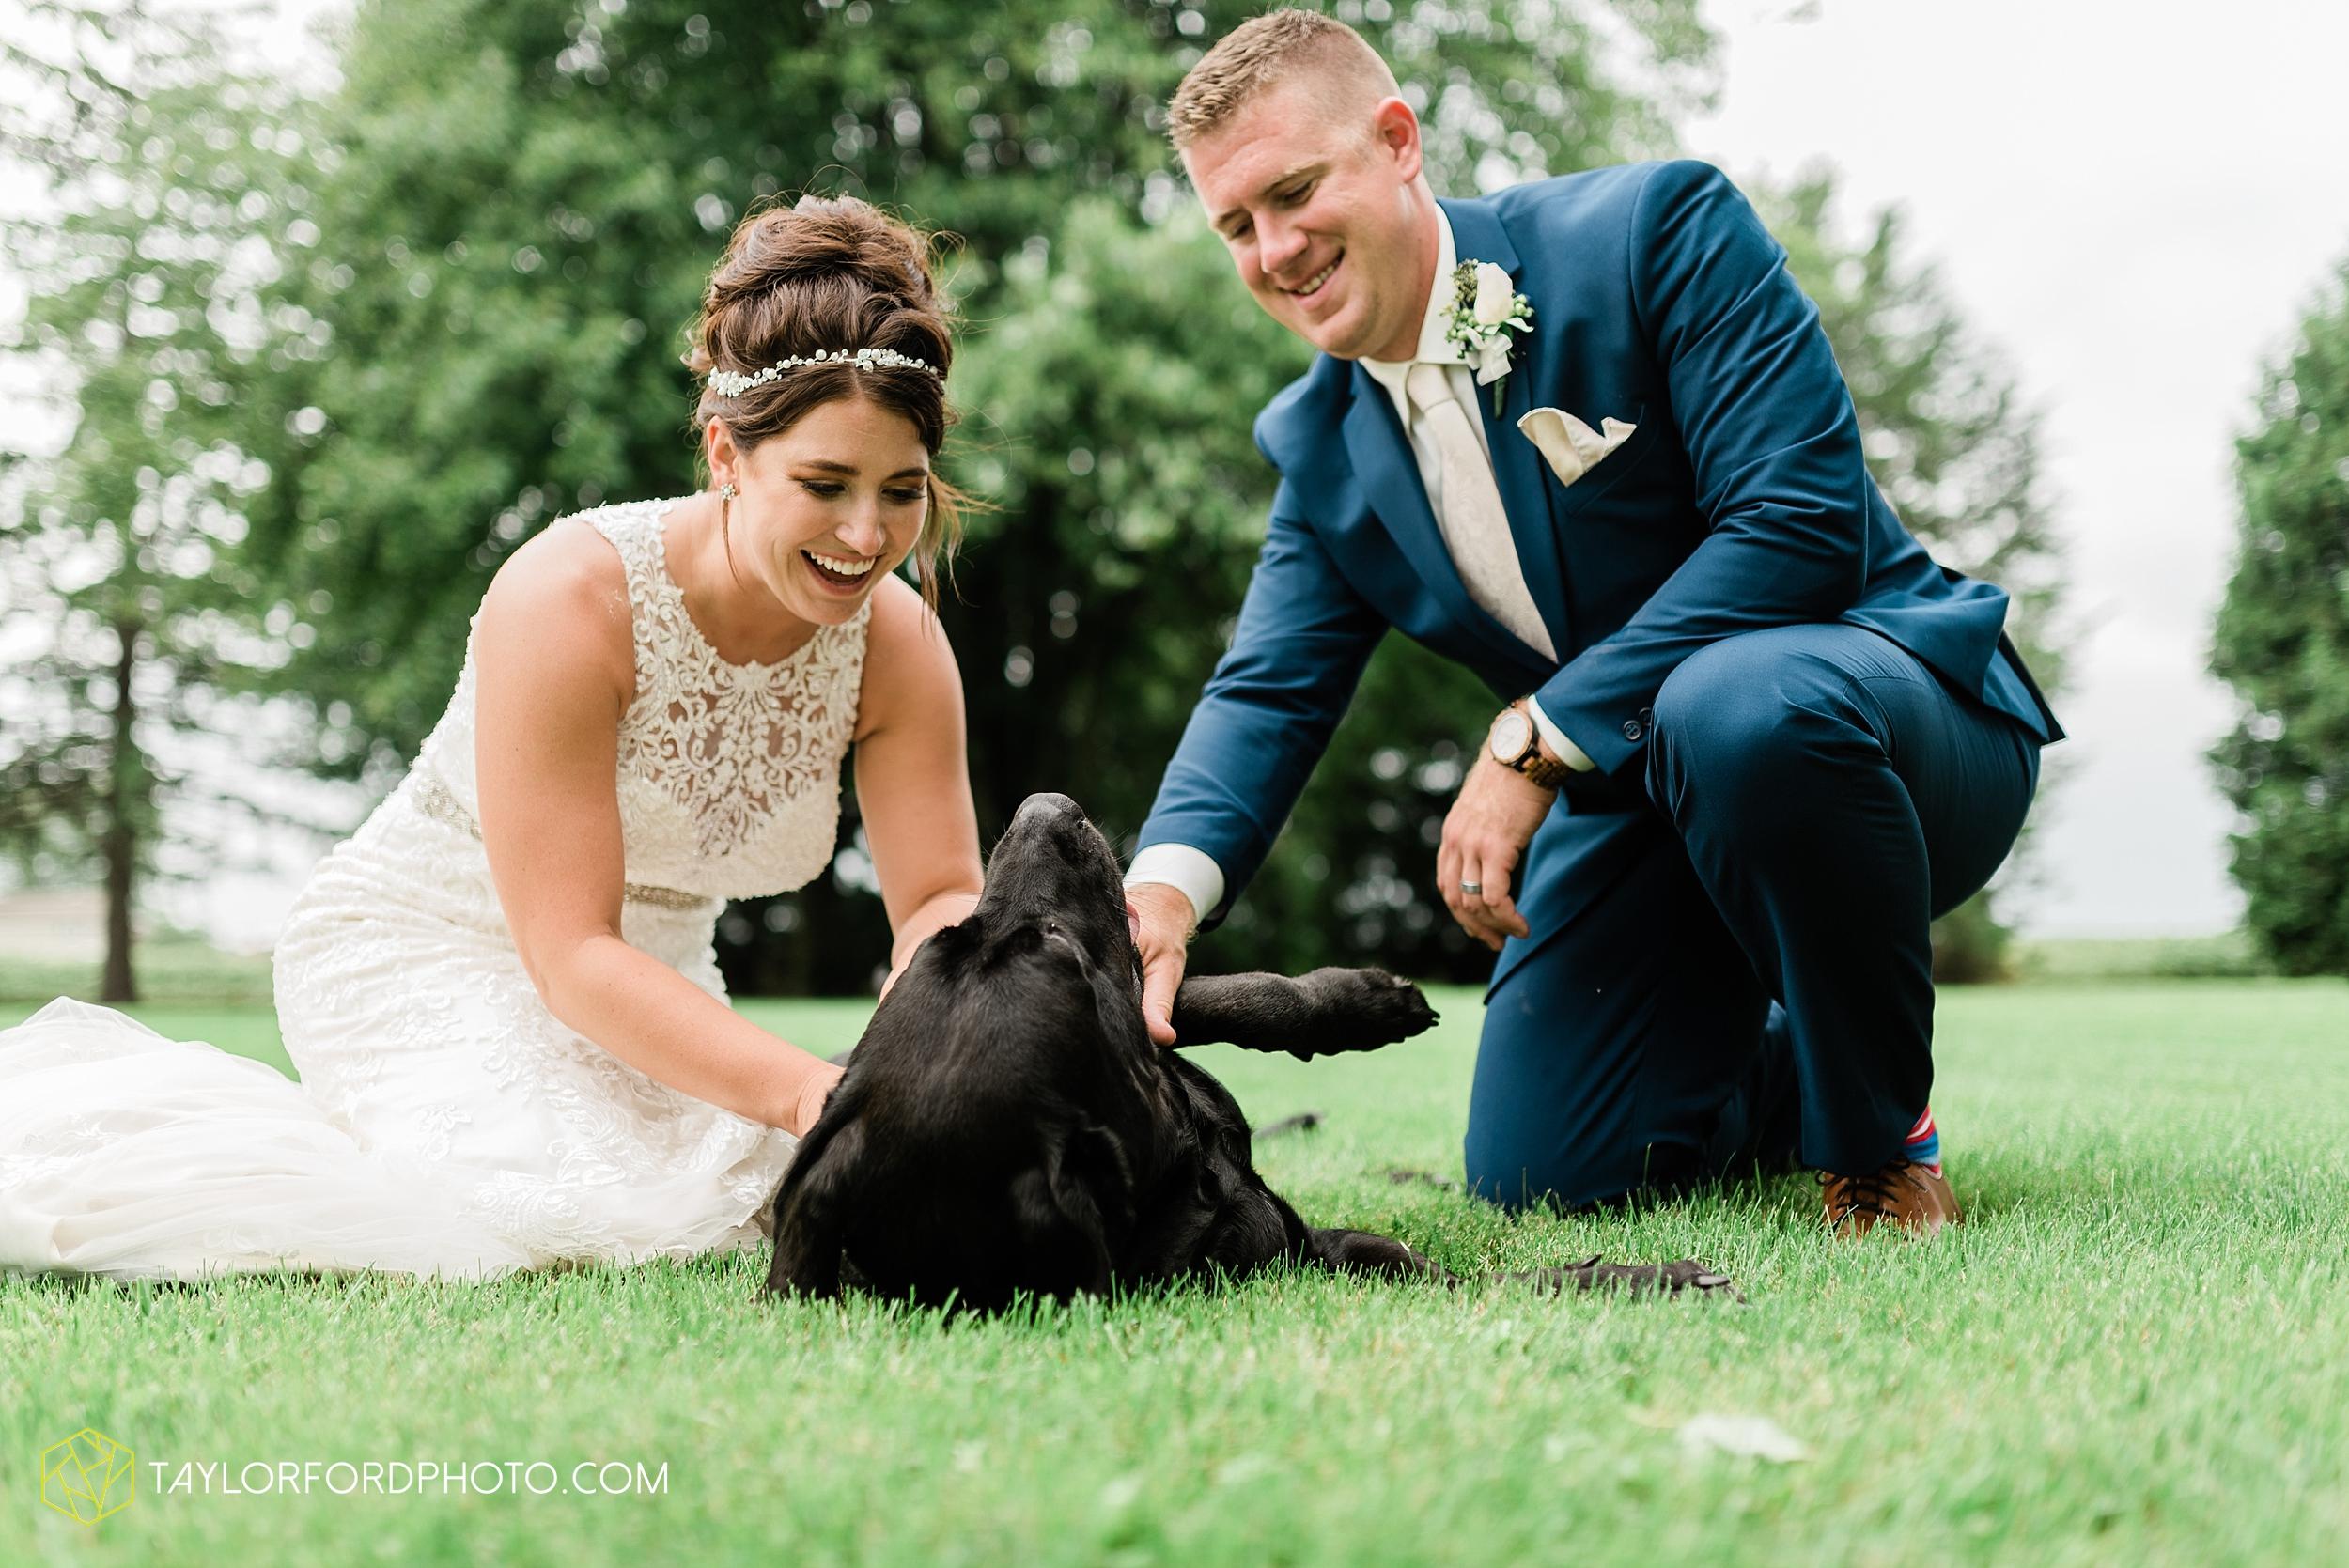 van-wert-ohio-first-united-methodist-church-county-dairy-barn-wedding-photographer-taylor-ford-photography_9860.jpg